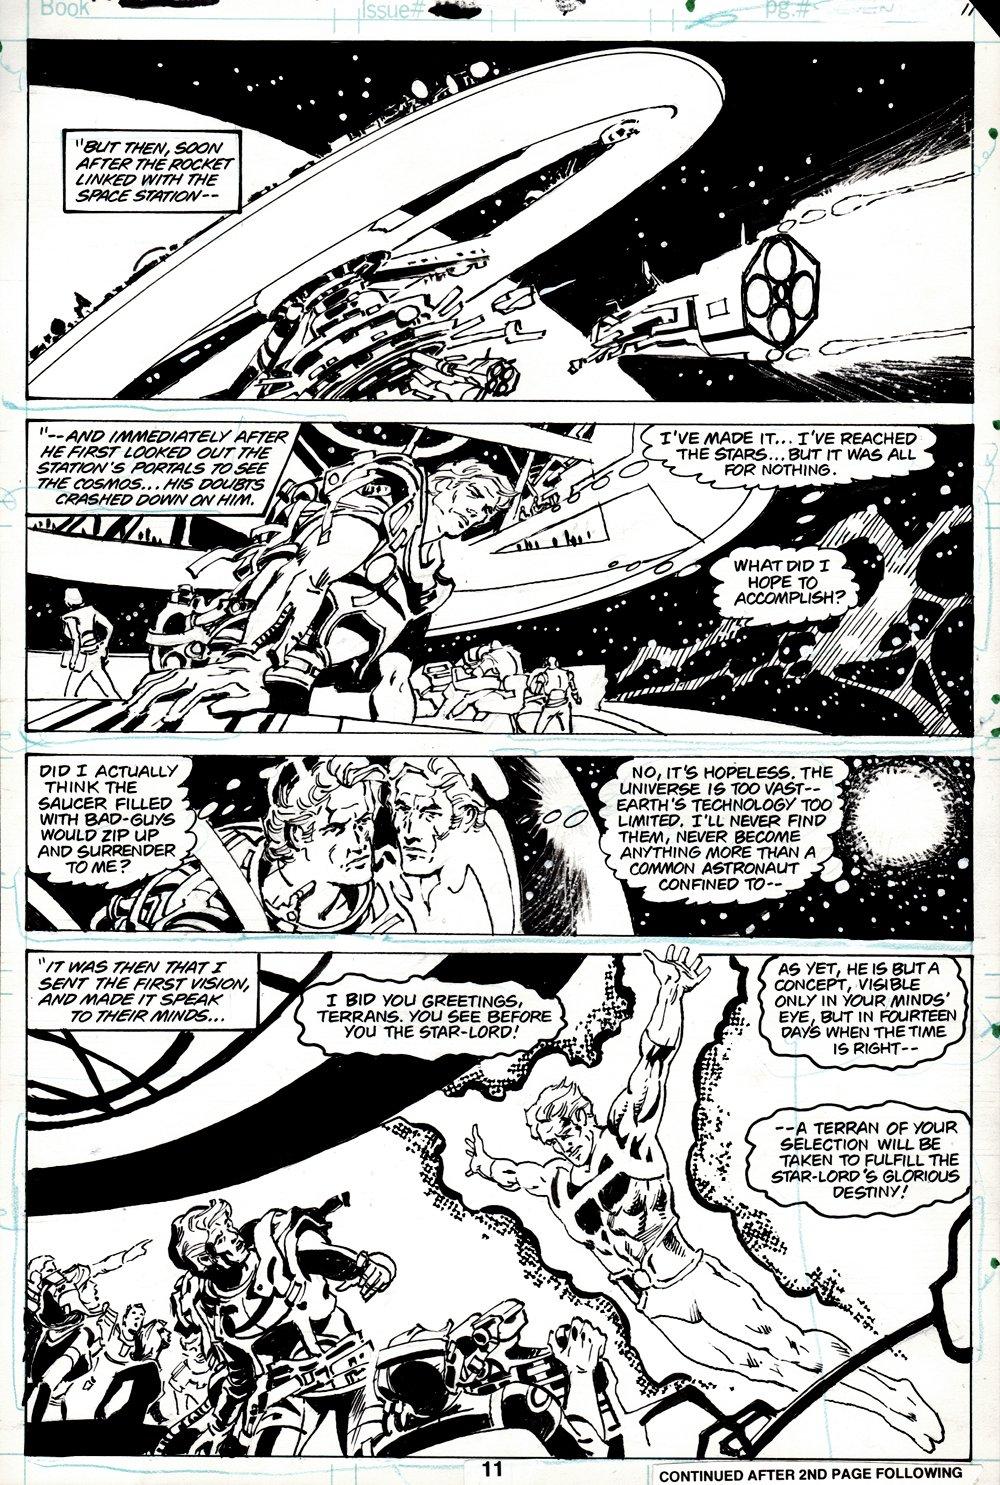 Marvel Spotlight #6 p 11 (COVER SCENE! EARLY STARLORD ORIGIN STORY!) 1978